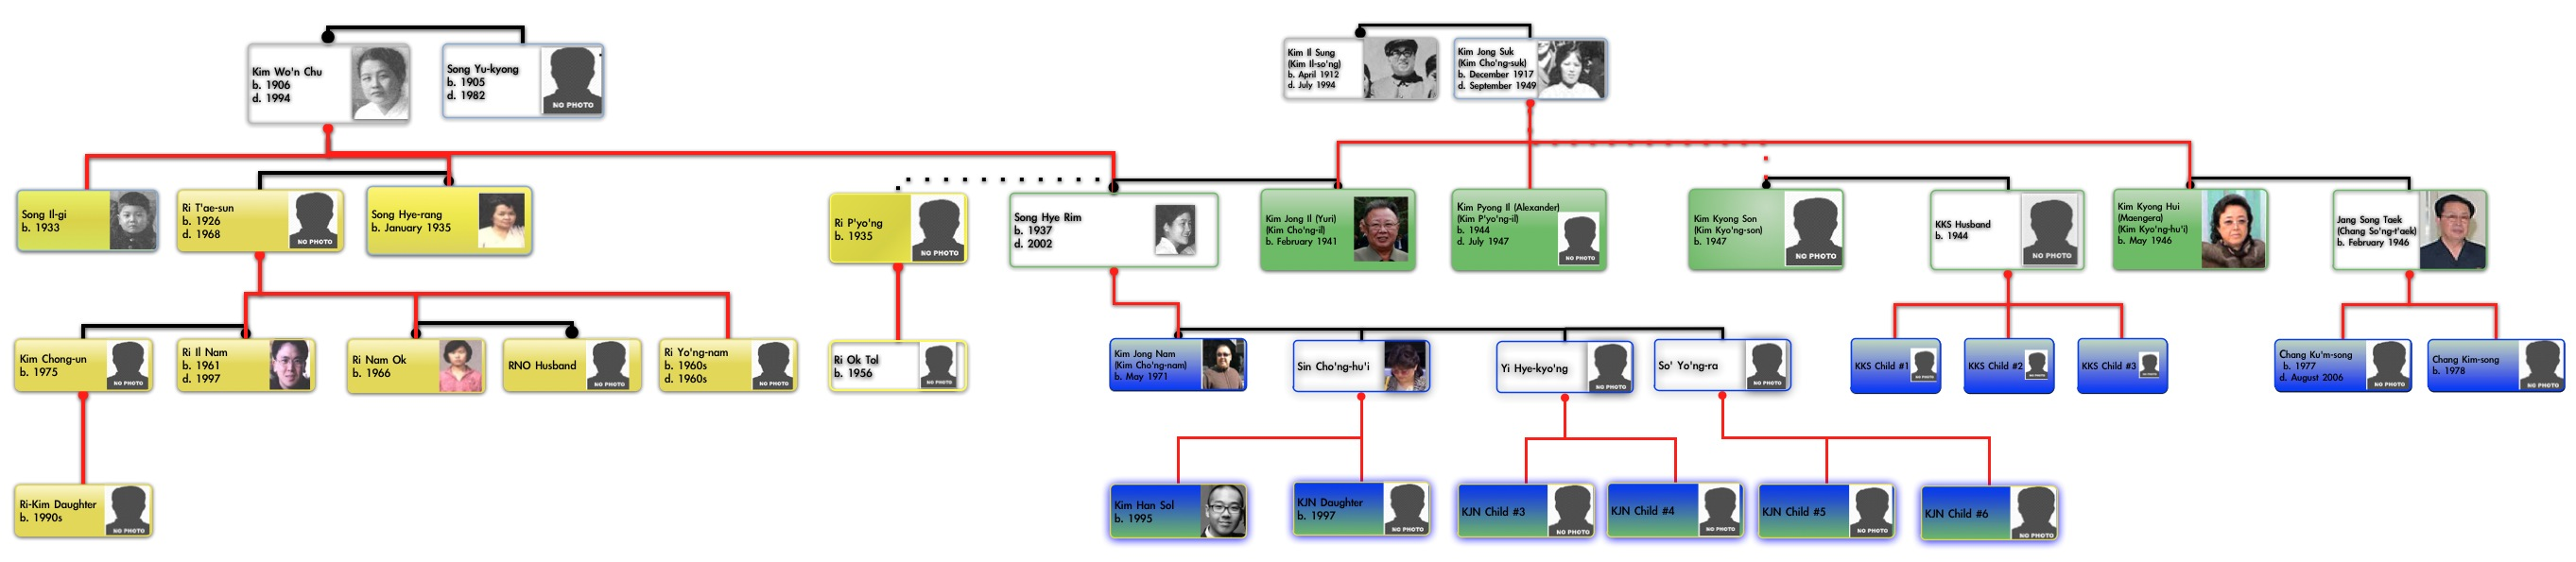 Sample essay maps image 4